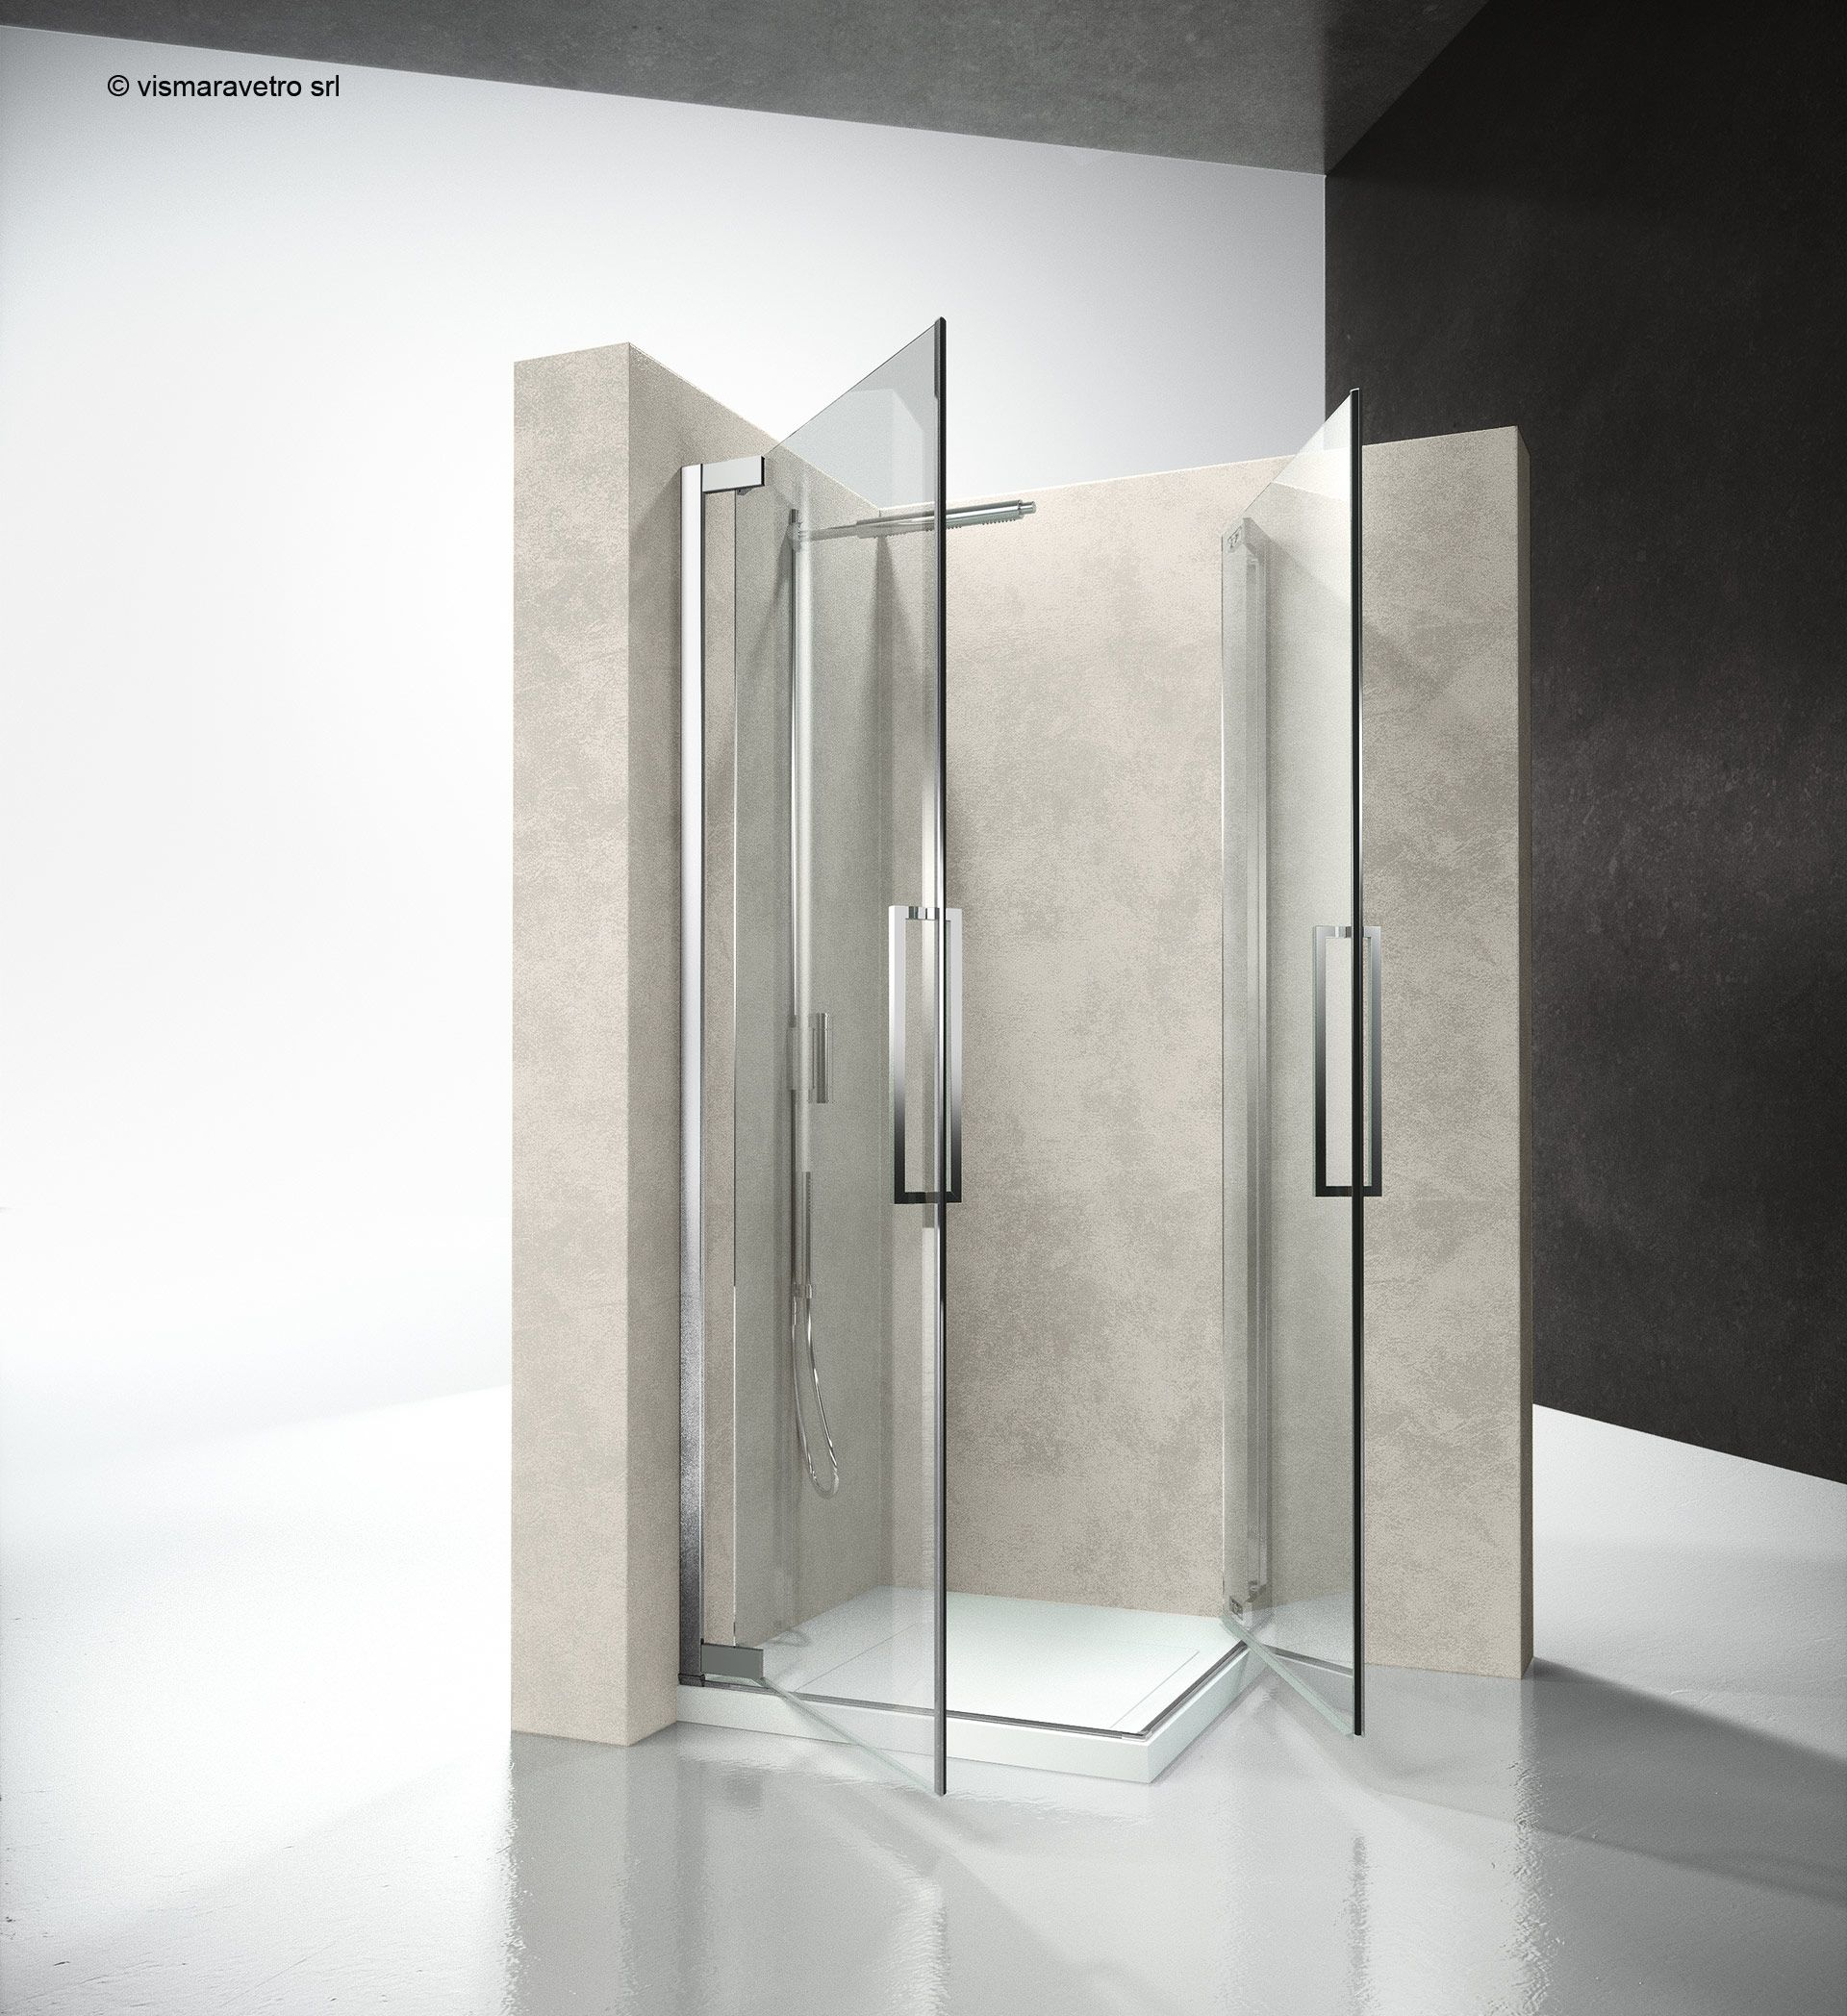 Fa Fa Flare Shower Enclosures Models Pivot Door Hinged Door Shower Enclosure Flare The New Hinged Door Shower Enclosure By Vis Badezimmer Baden Zimmer